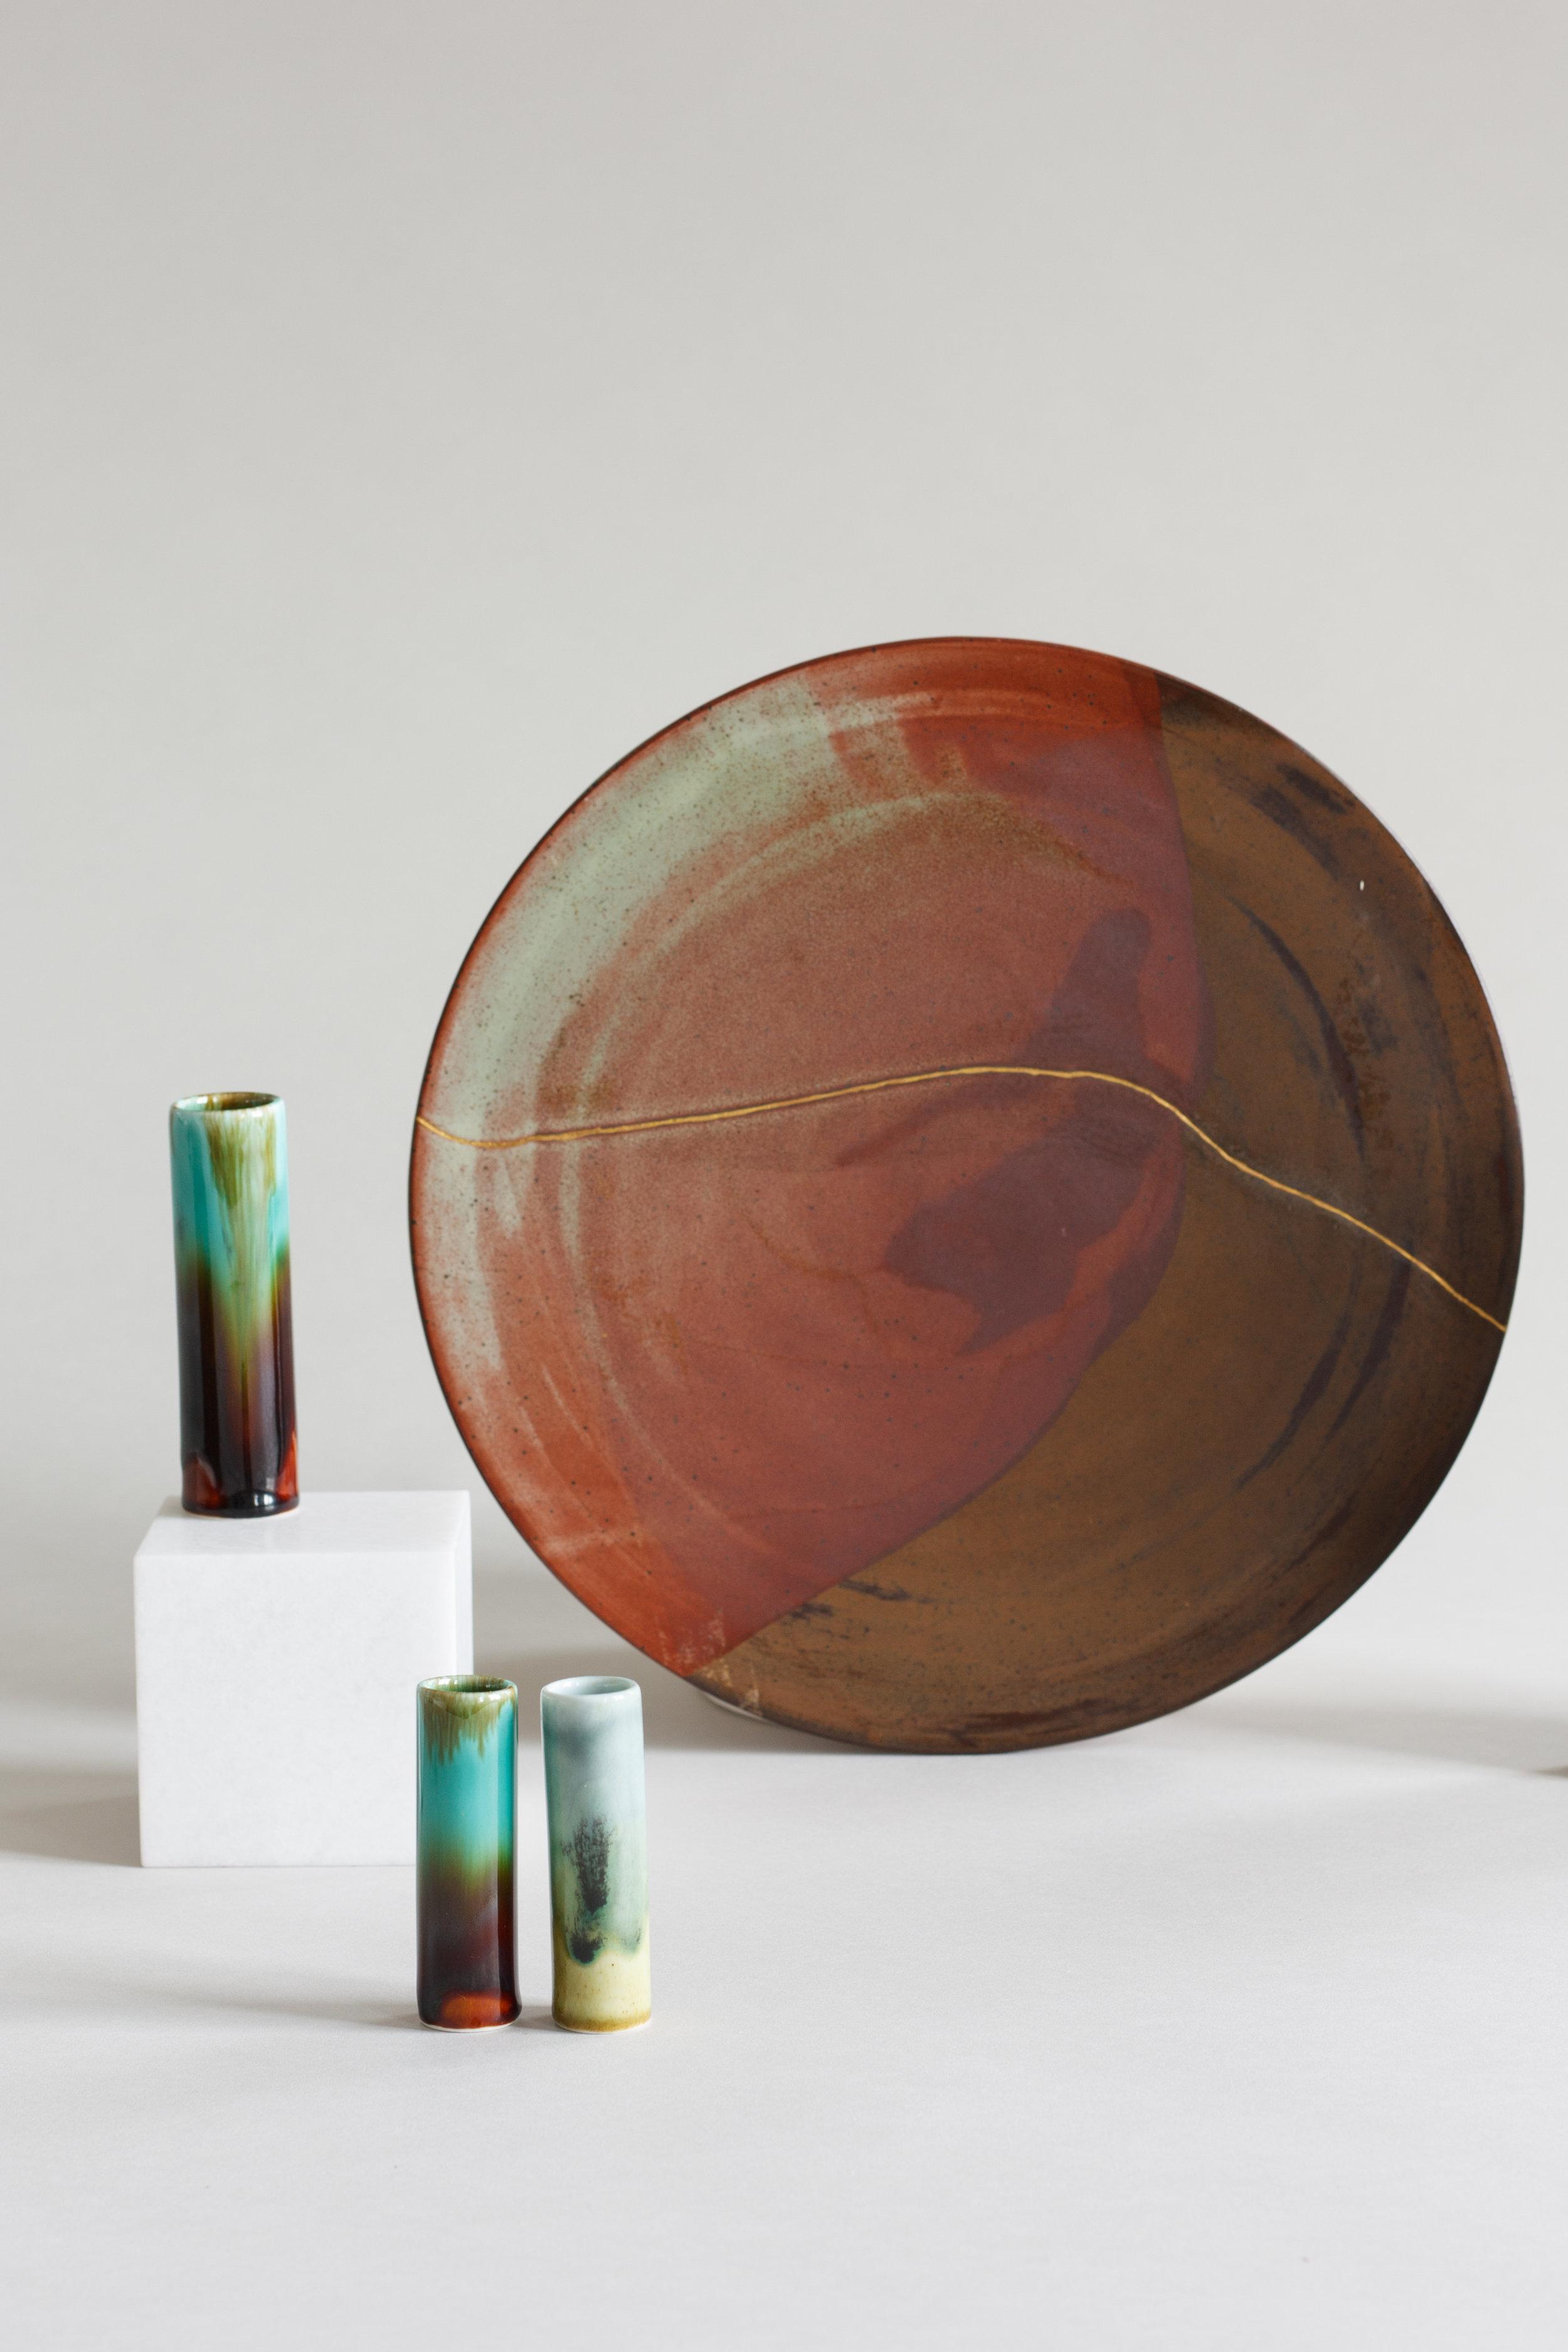 kinstugi-plates-and-ldf-glazes-group-image-tests-4_27429092100_o.jpg